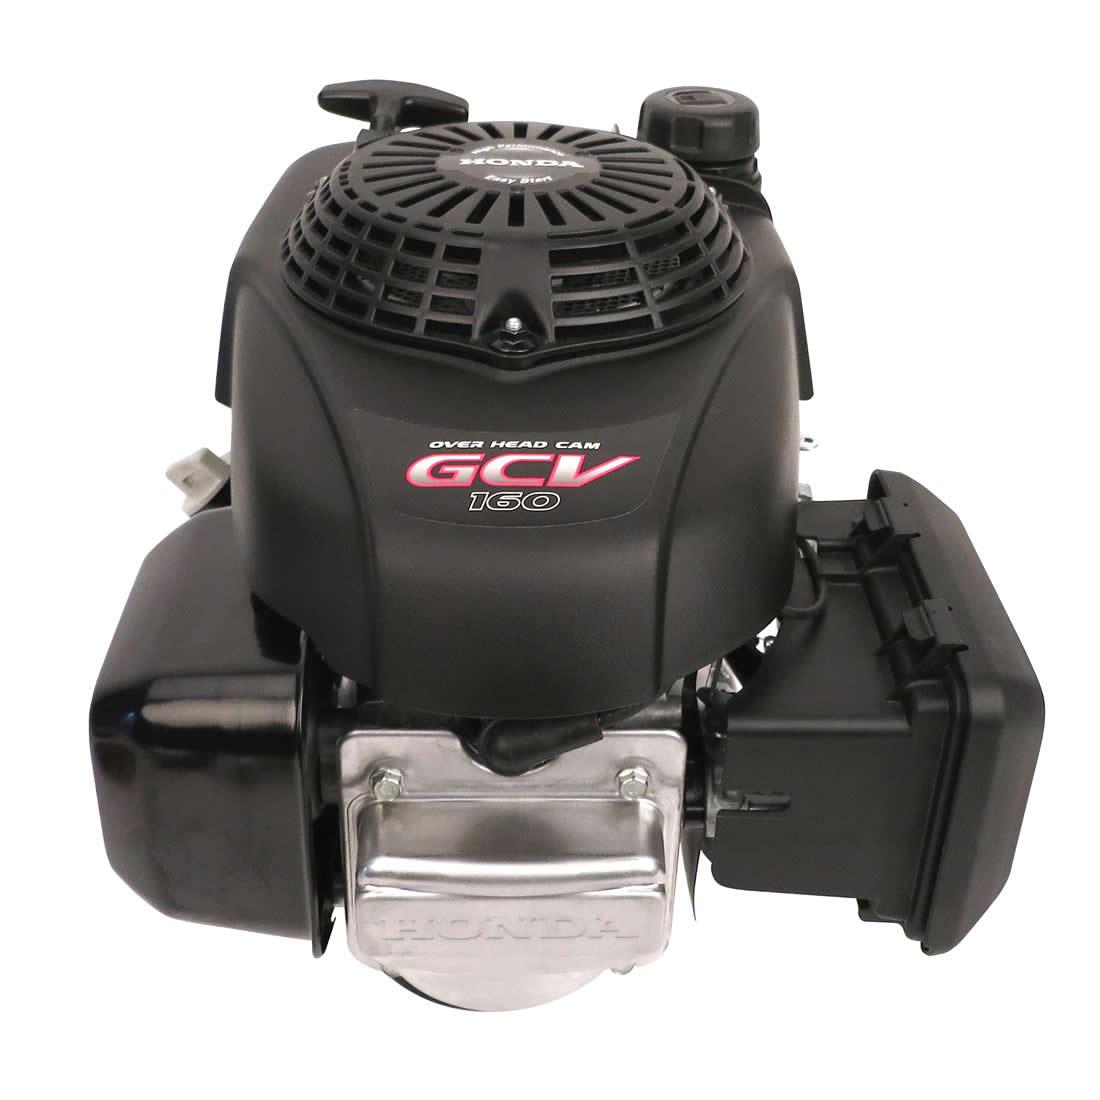 honda gcv160 pressure washer manual